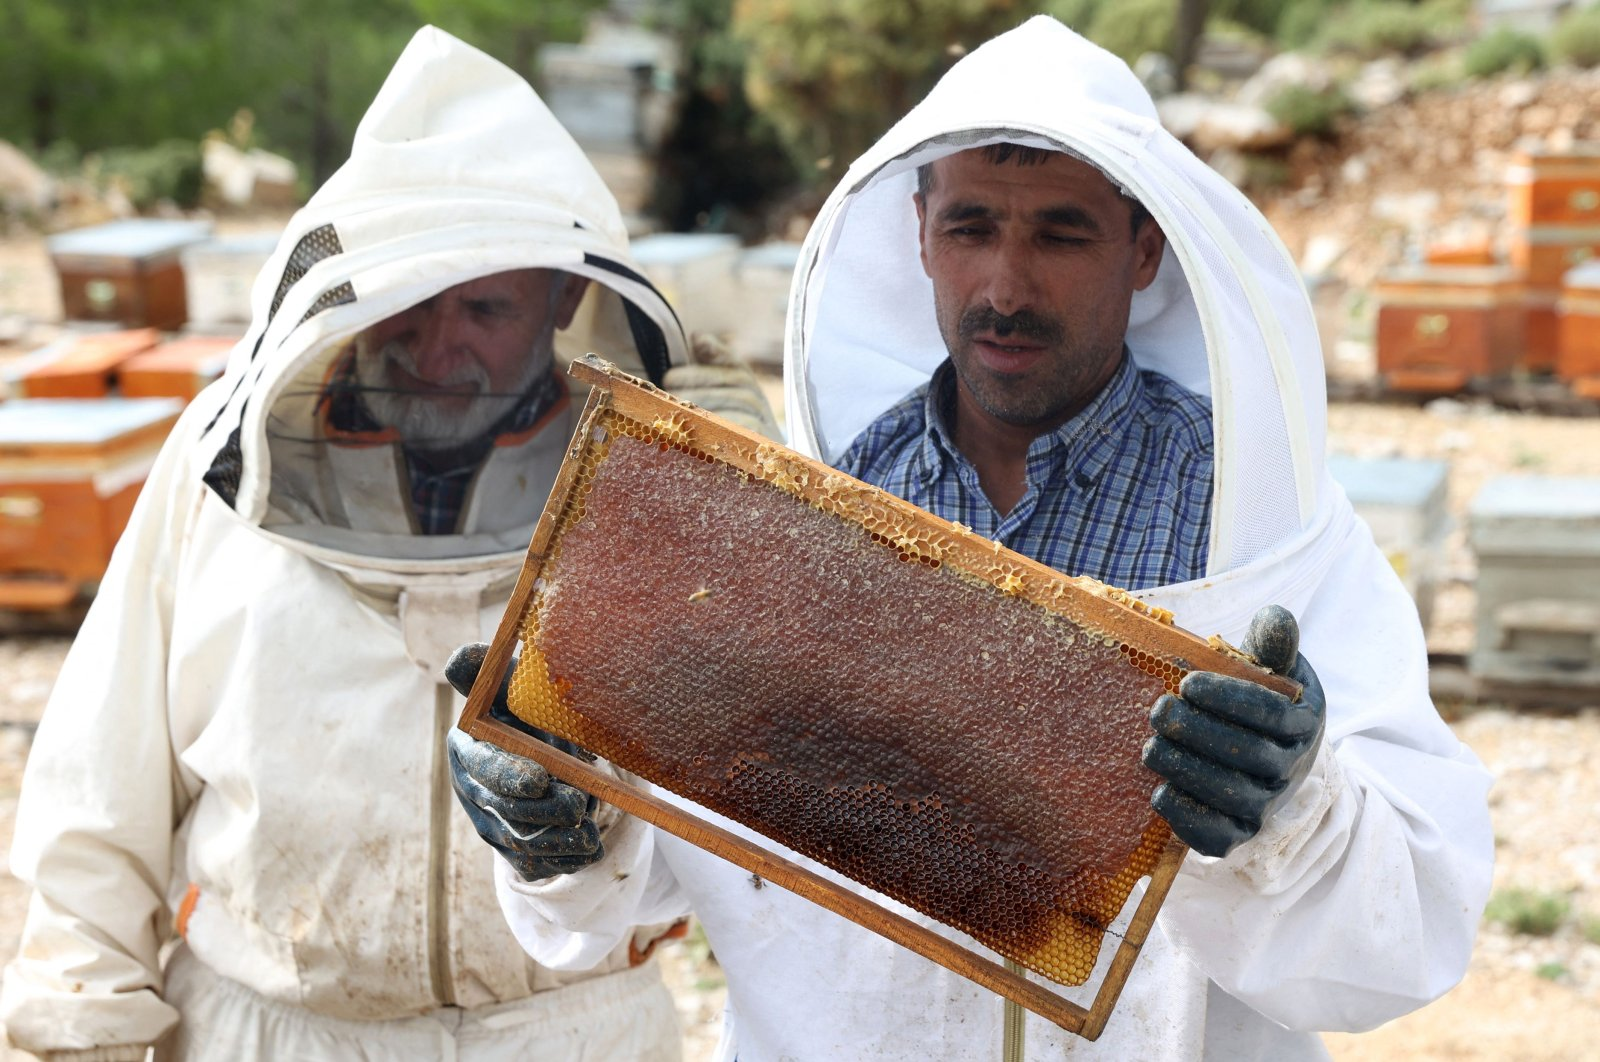 Turkish beekeepers Fehmi Altı (R), 47, and his father Mustafa Altı, 71, look at their bees, in the village of Çökek, Muğla province, southwestern Turkey, Sept. 23, 2021. (AFP Photo)